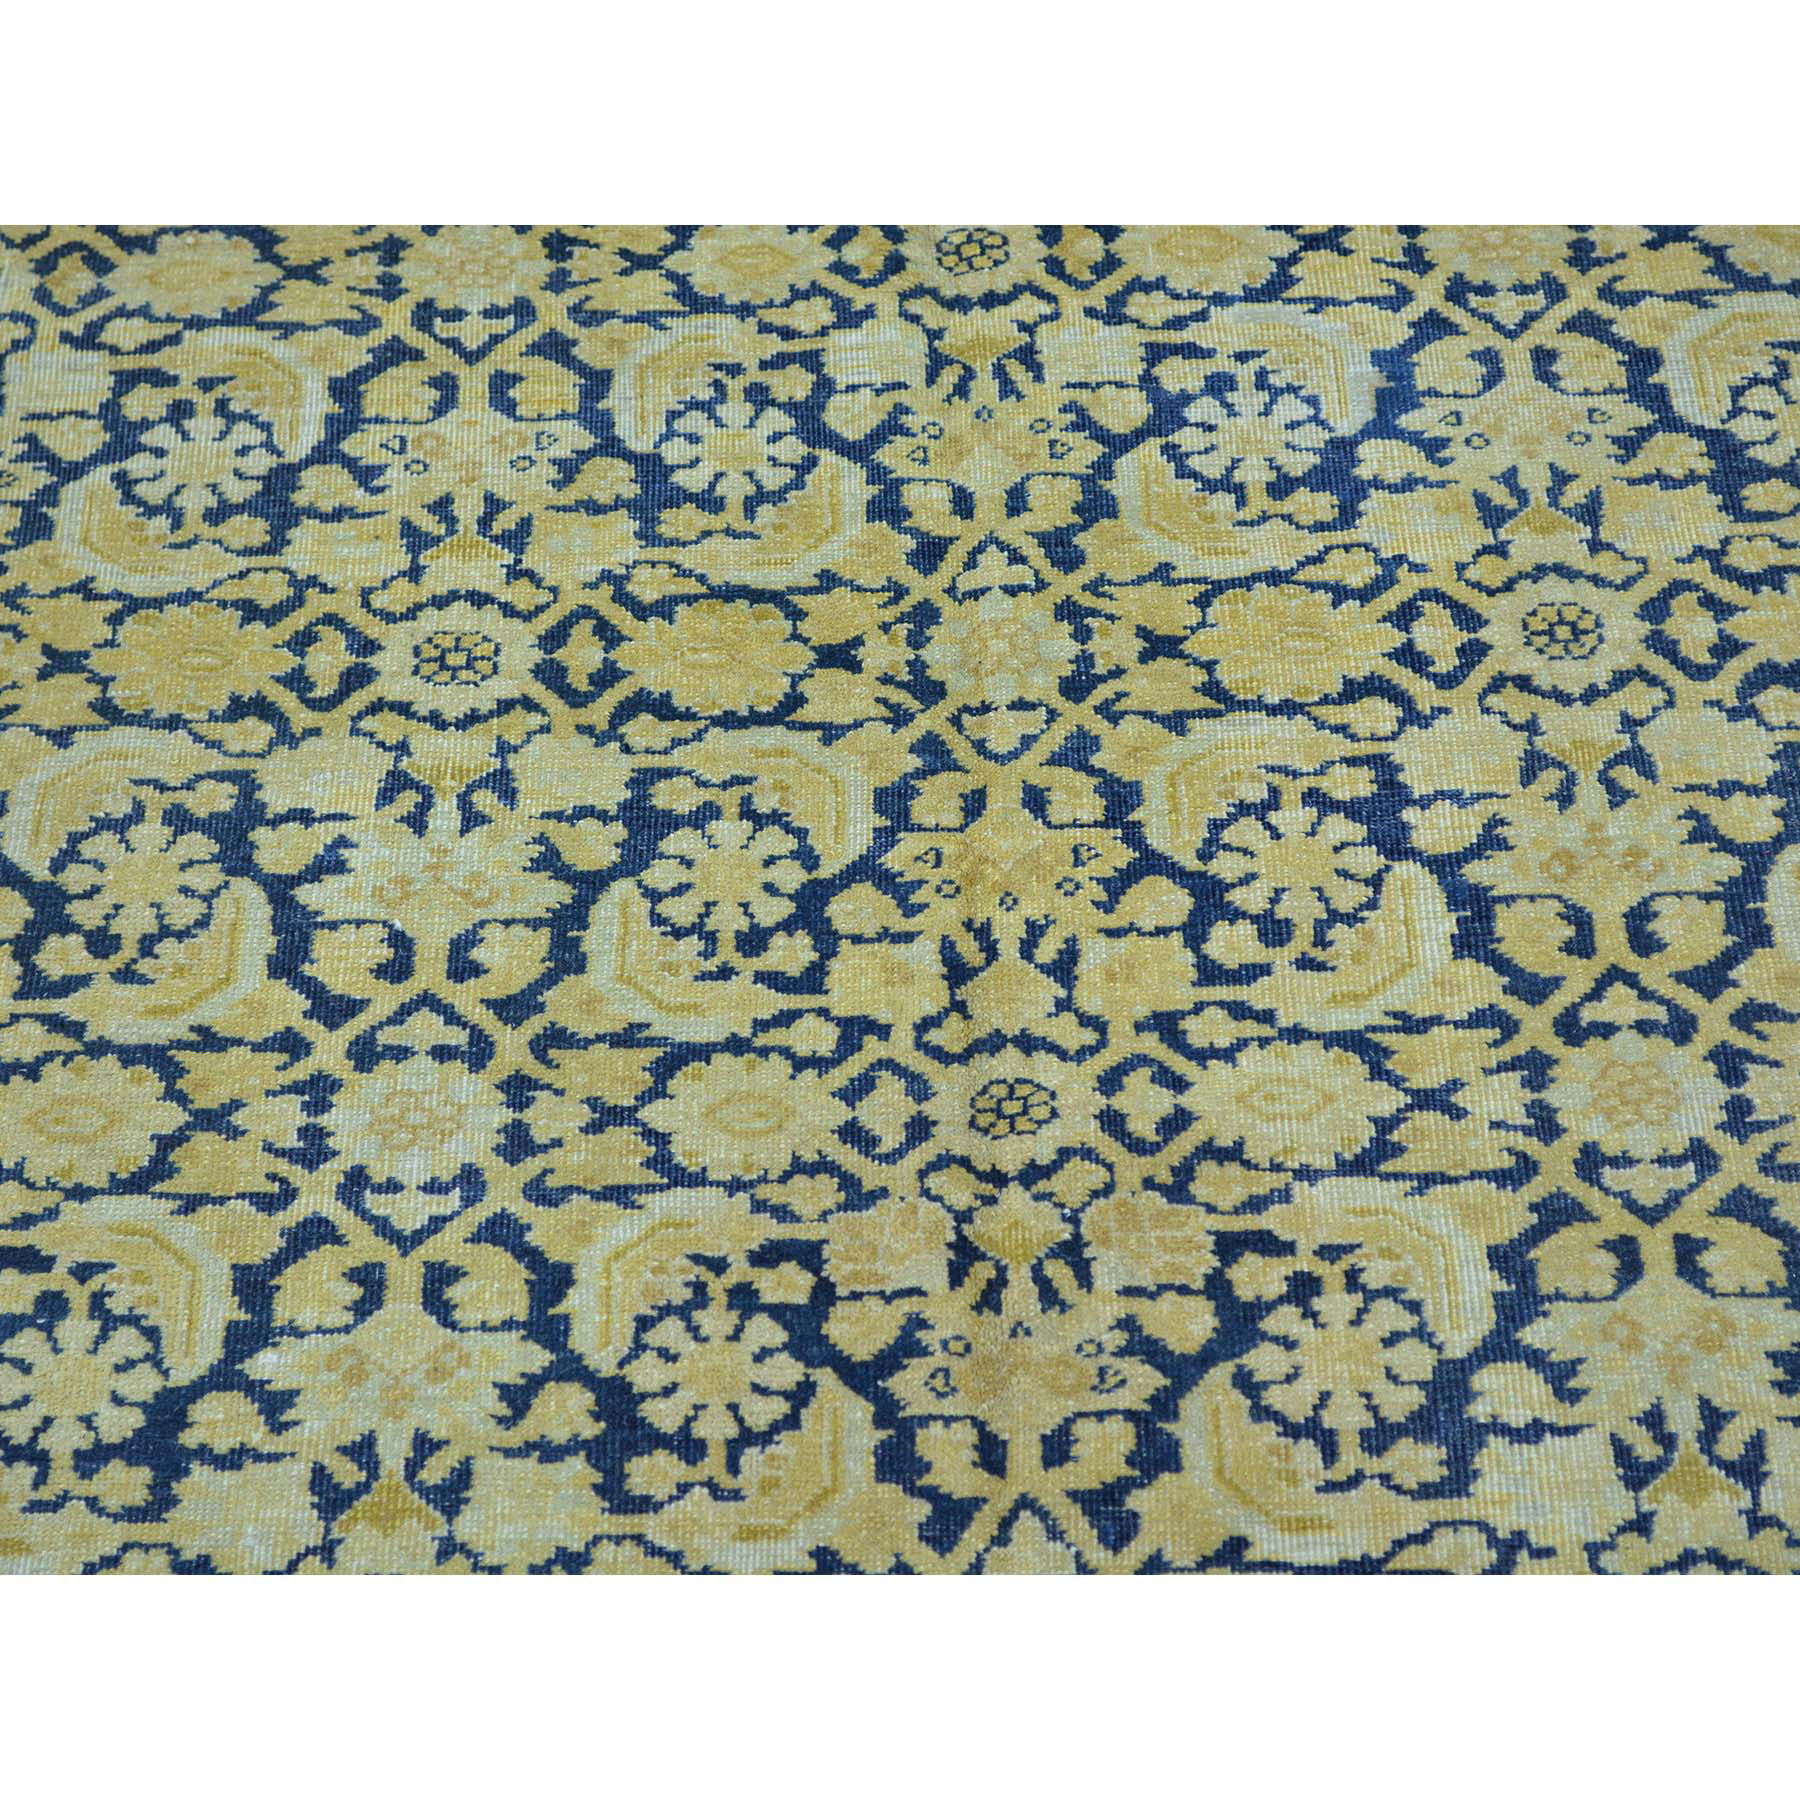 8-9 x16- Antique Laristan Exc Condition Handmade Gallery Size Rug